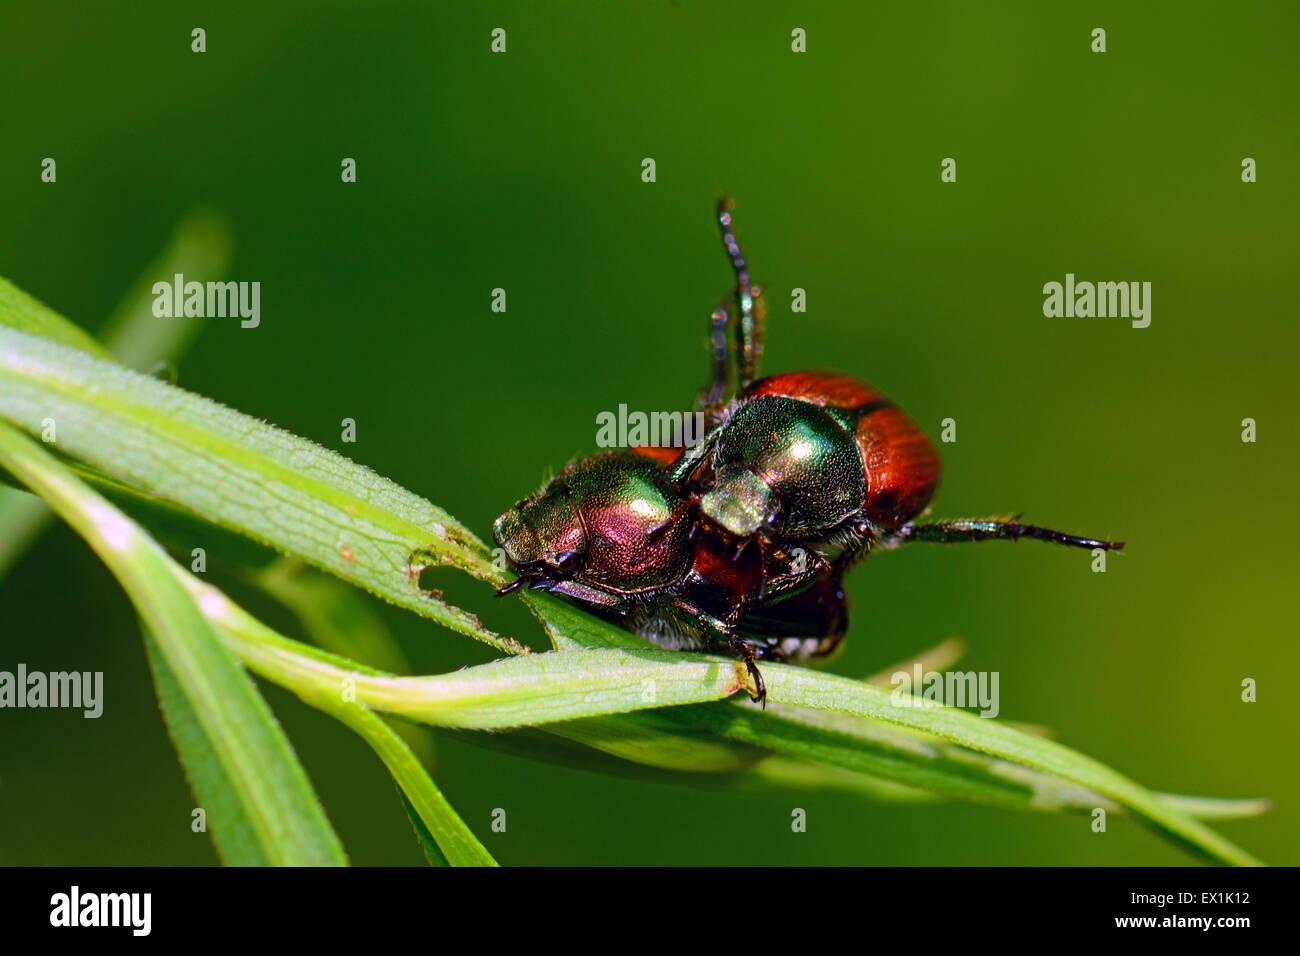 Beetles mating Stock Photo